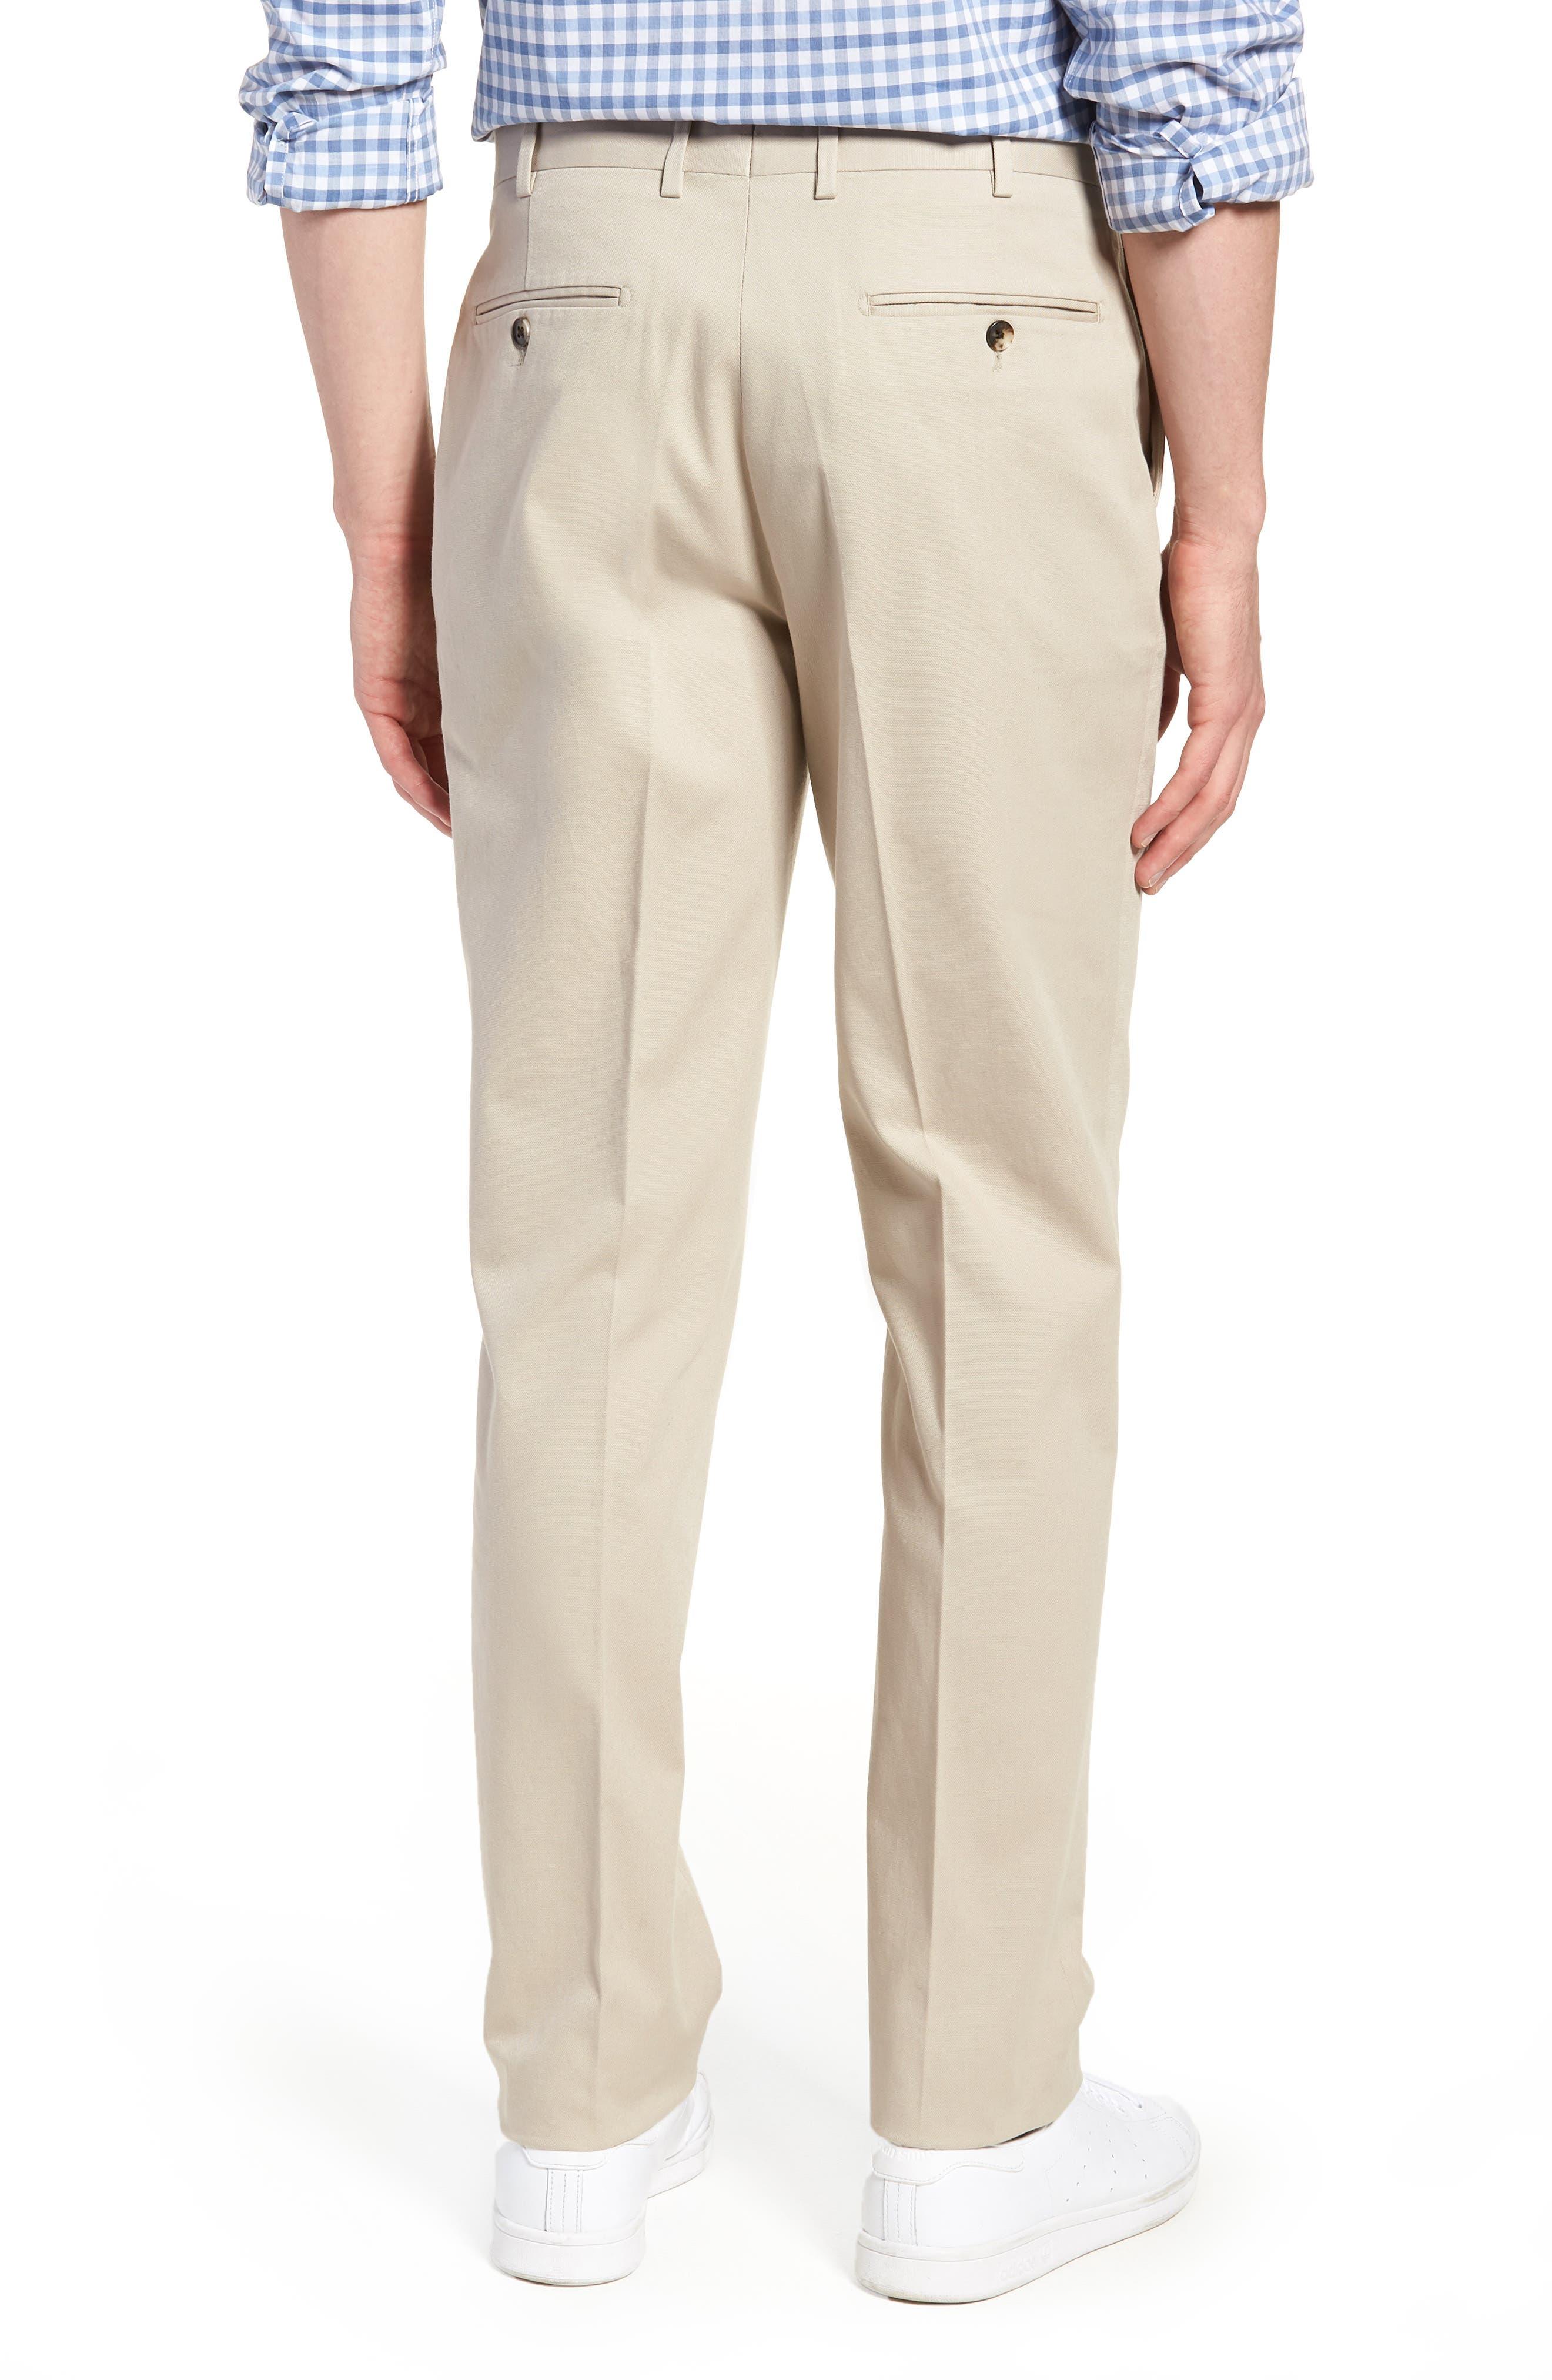 Finchley Regular Fit Pants,                             Alternate thumbnail 2, color,                             102